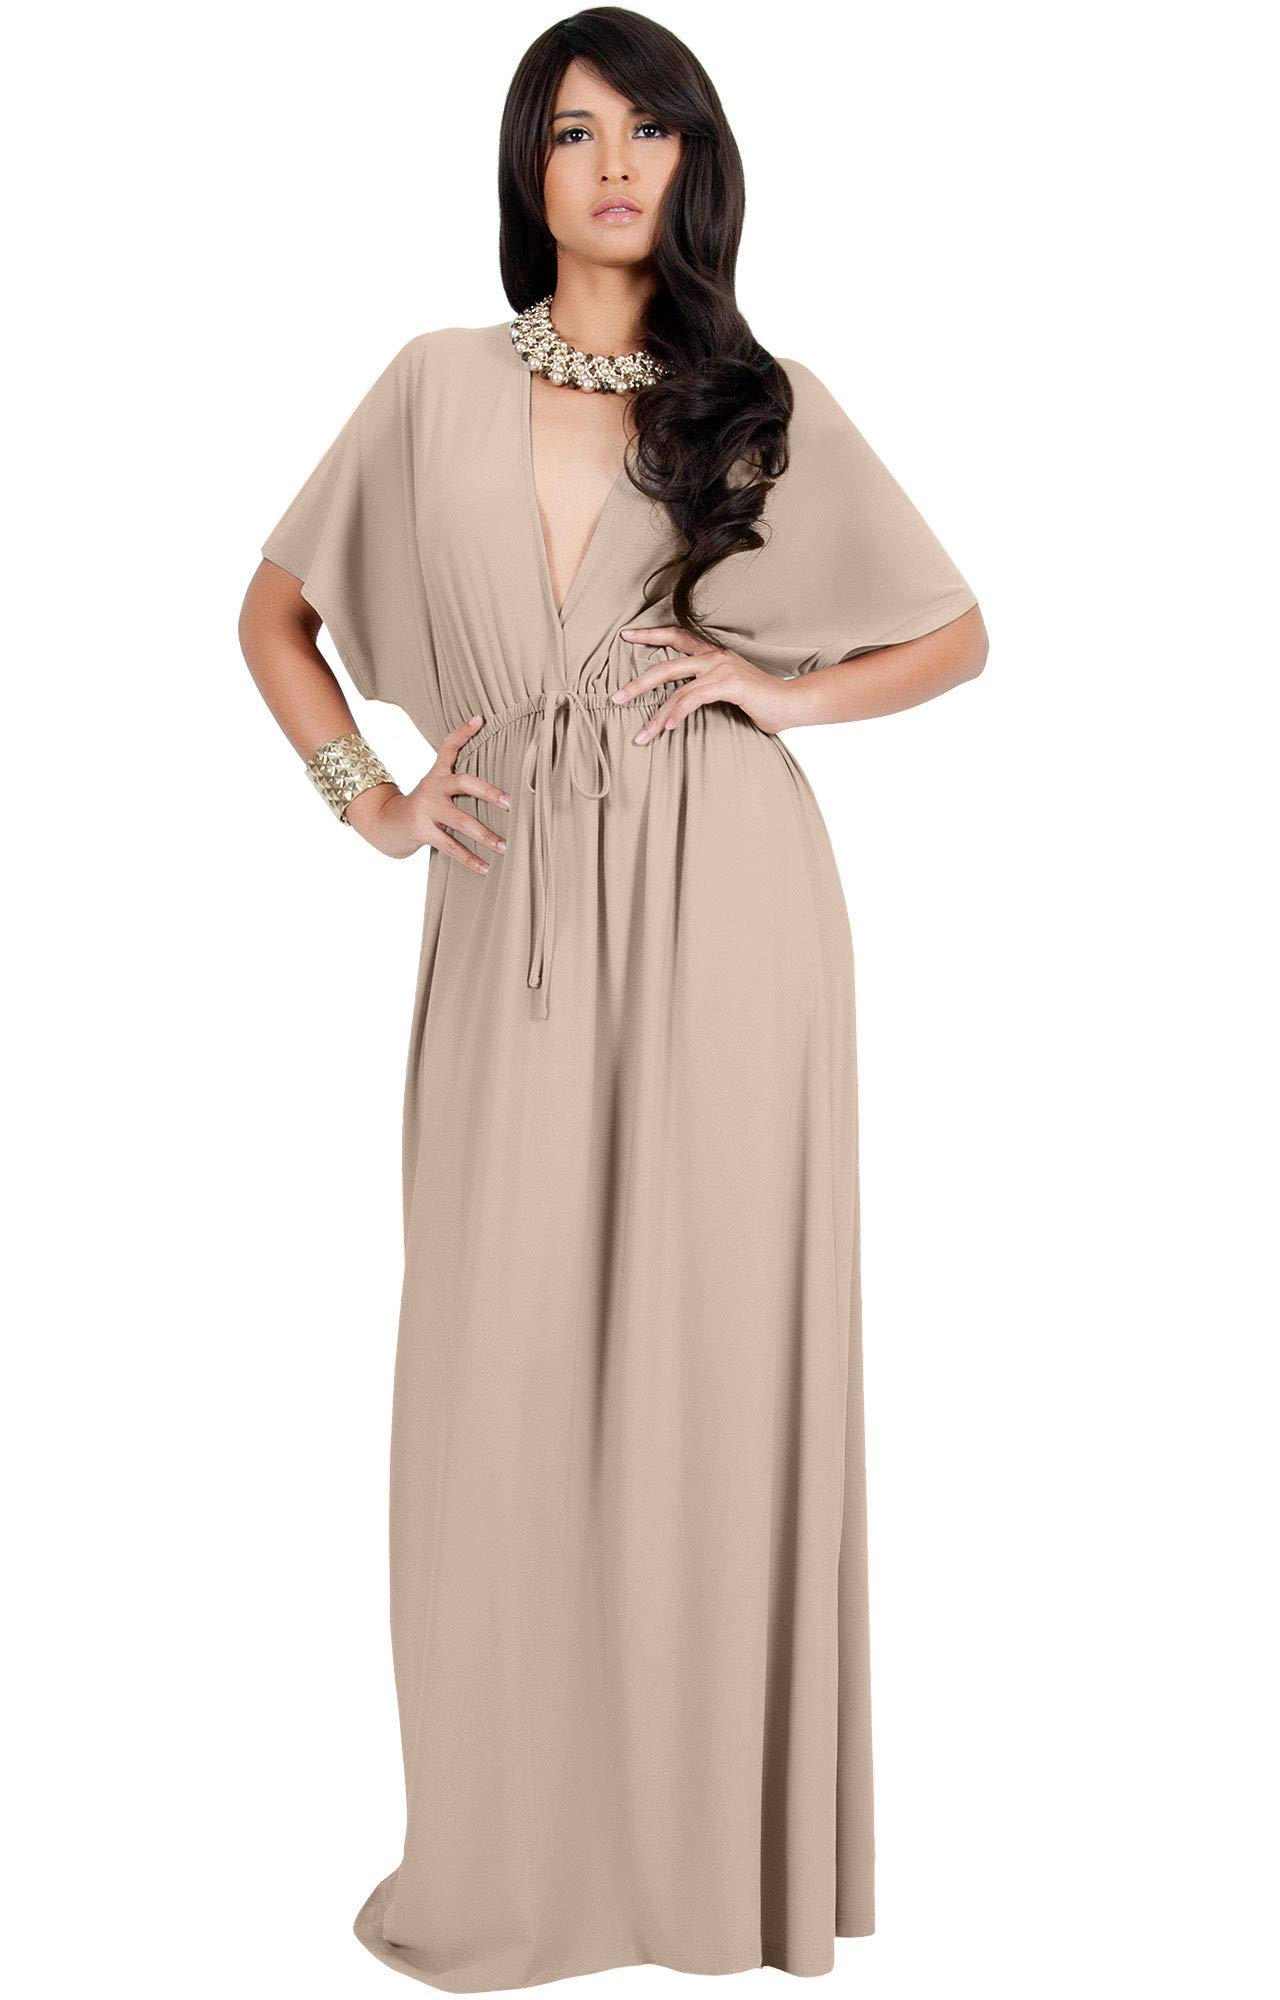 774b7dd085c KOH KOH Plus Size Womens Long Sexy Kimono Short Sleeve Casual V-Neck  Maternity Cocktail Summer Cute Flowy Kaftan Sundress Sundresses Gown Gowns  Maxi Dress ...